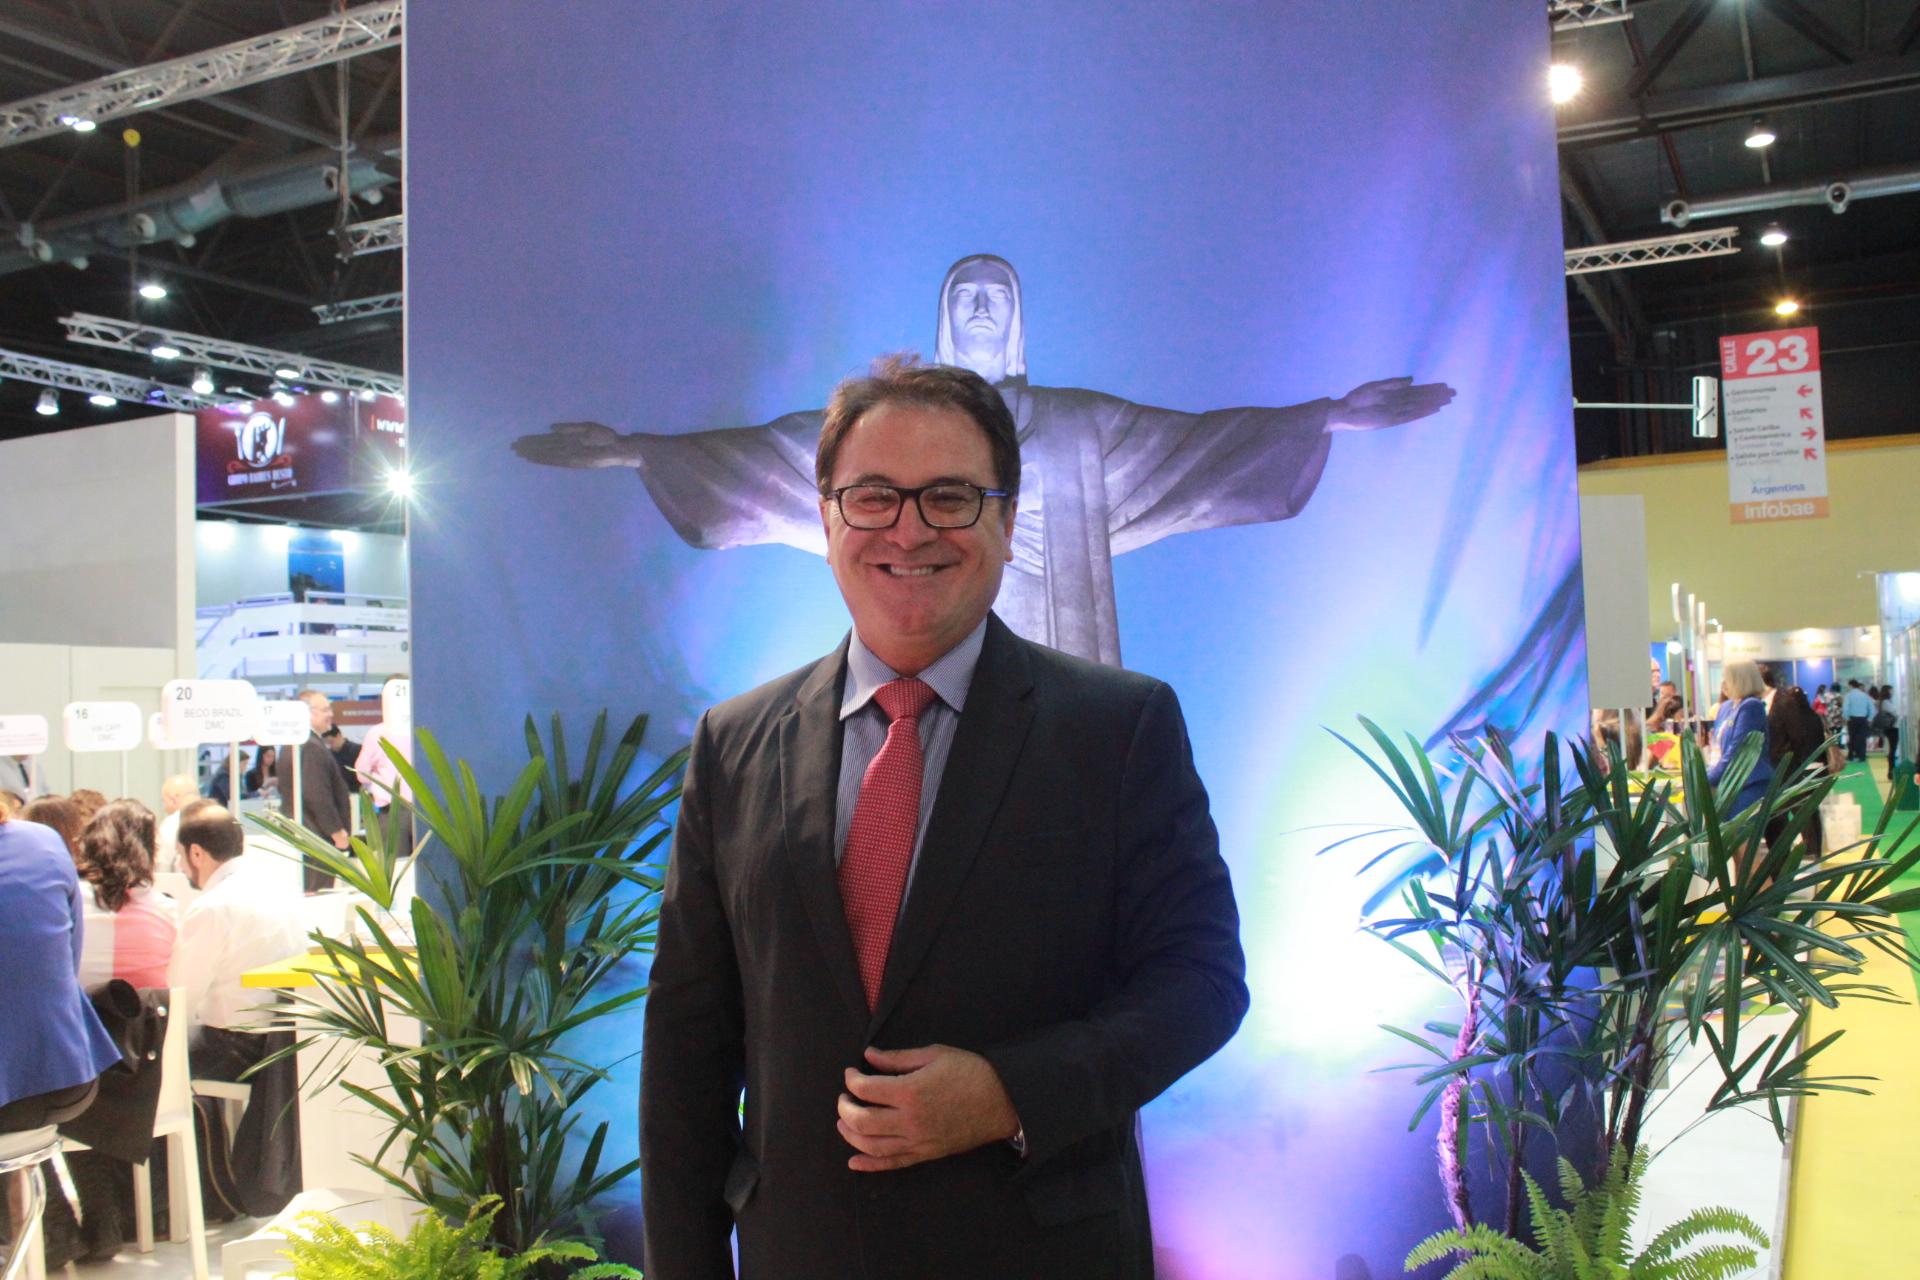 Presidente del Ente Brasileño de Turismo, Vinícius Lummertz